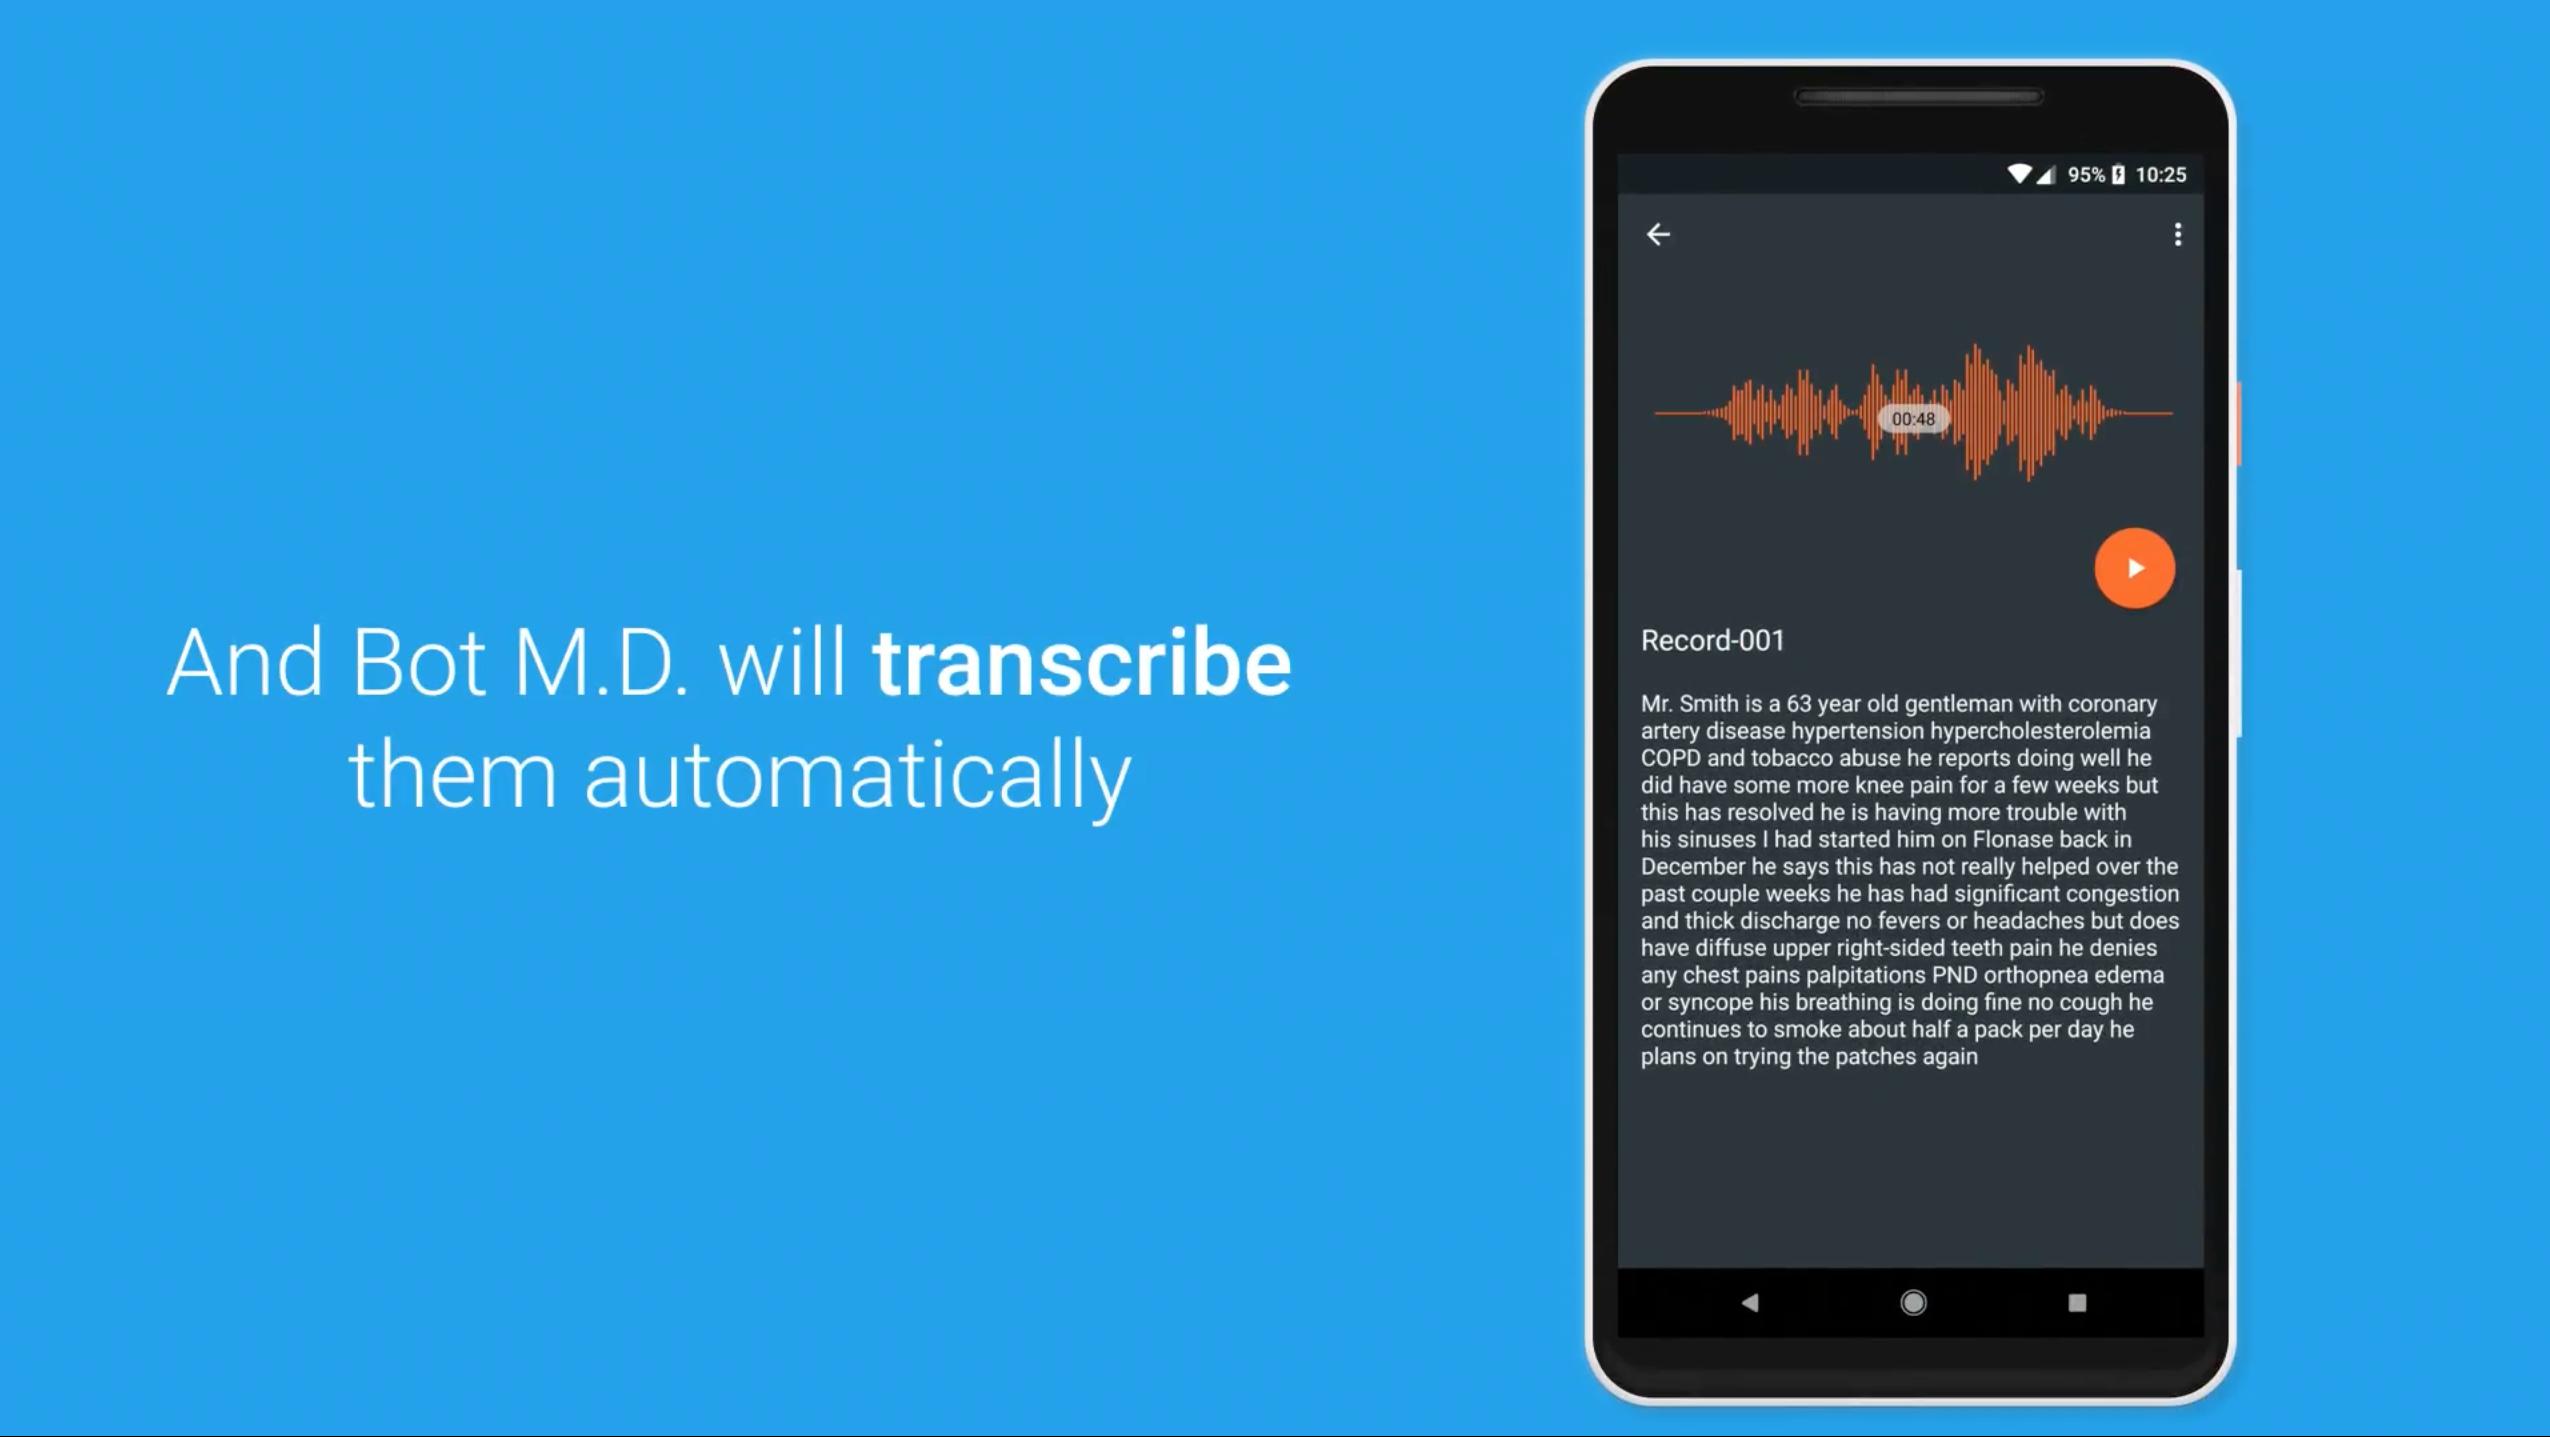 BotMD transcription